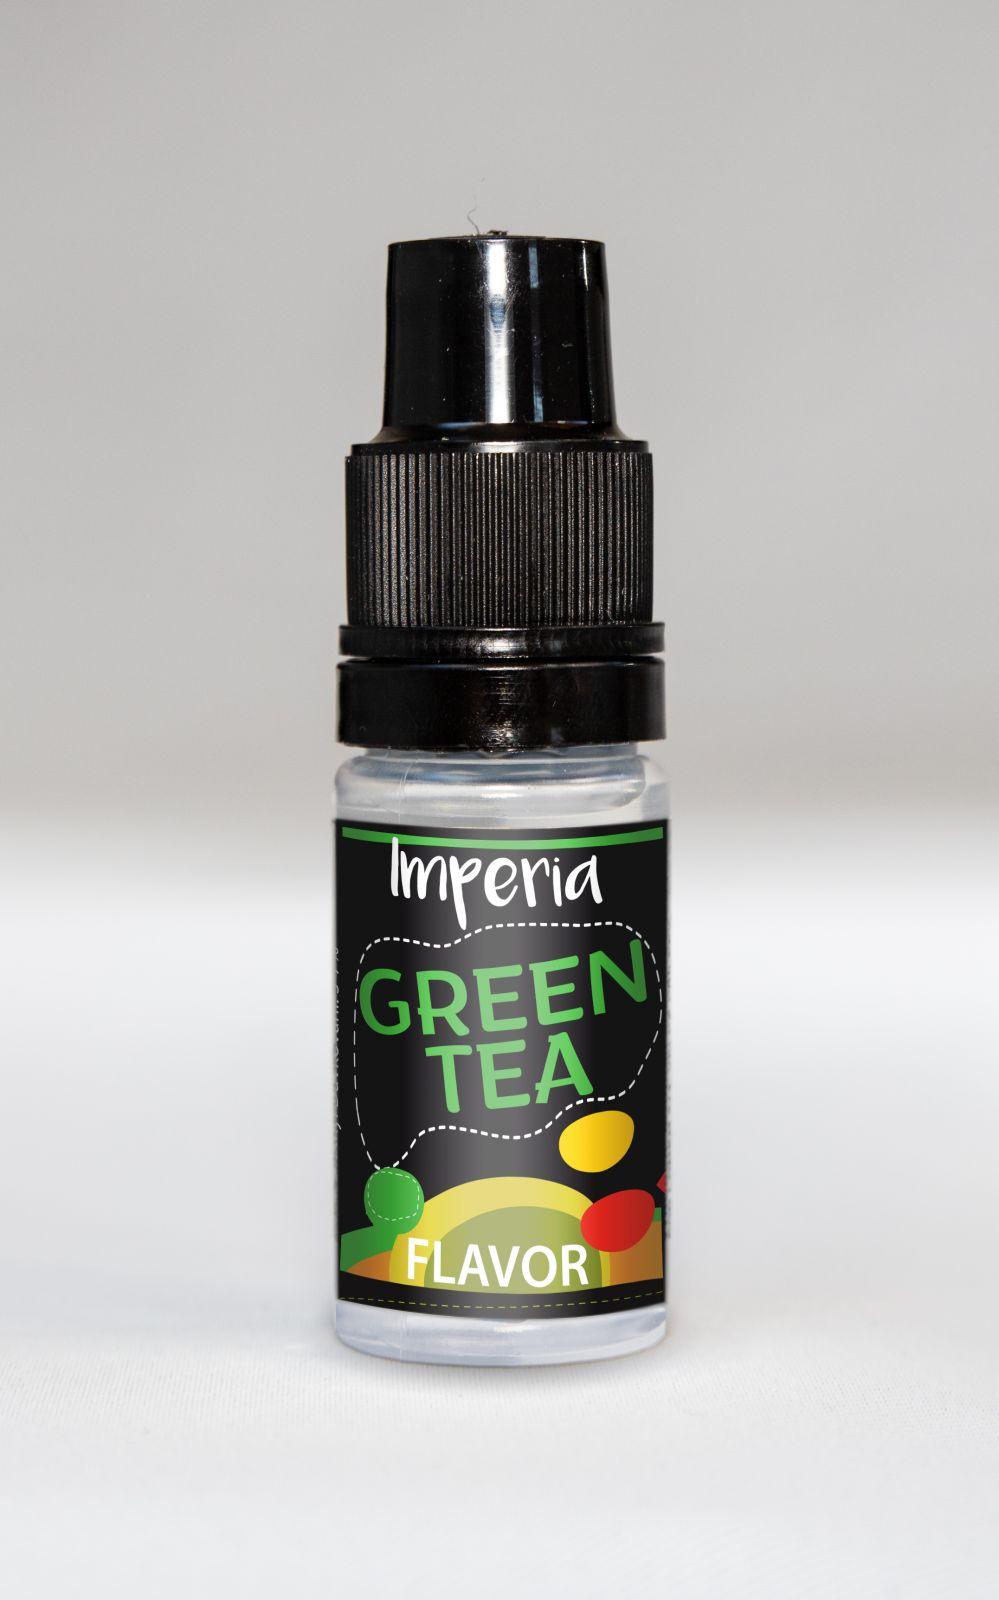 GREEN TEA / Zelený čaj - Aróma Imperia Black Label Boudoir Samadhi s.r.o.